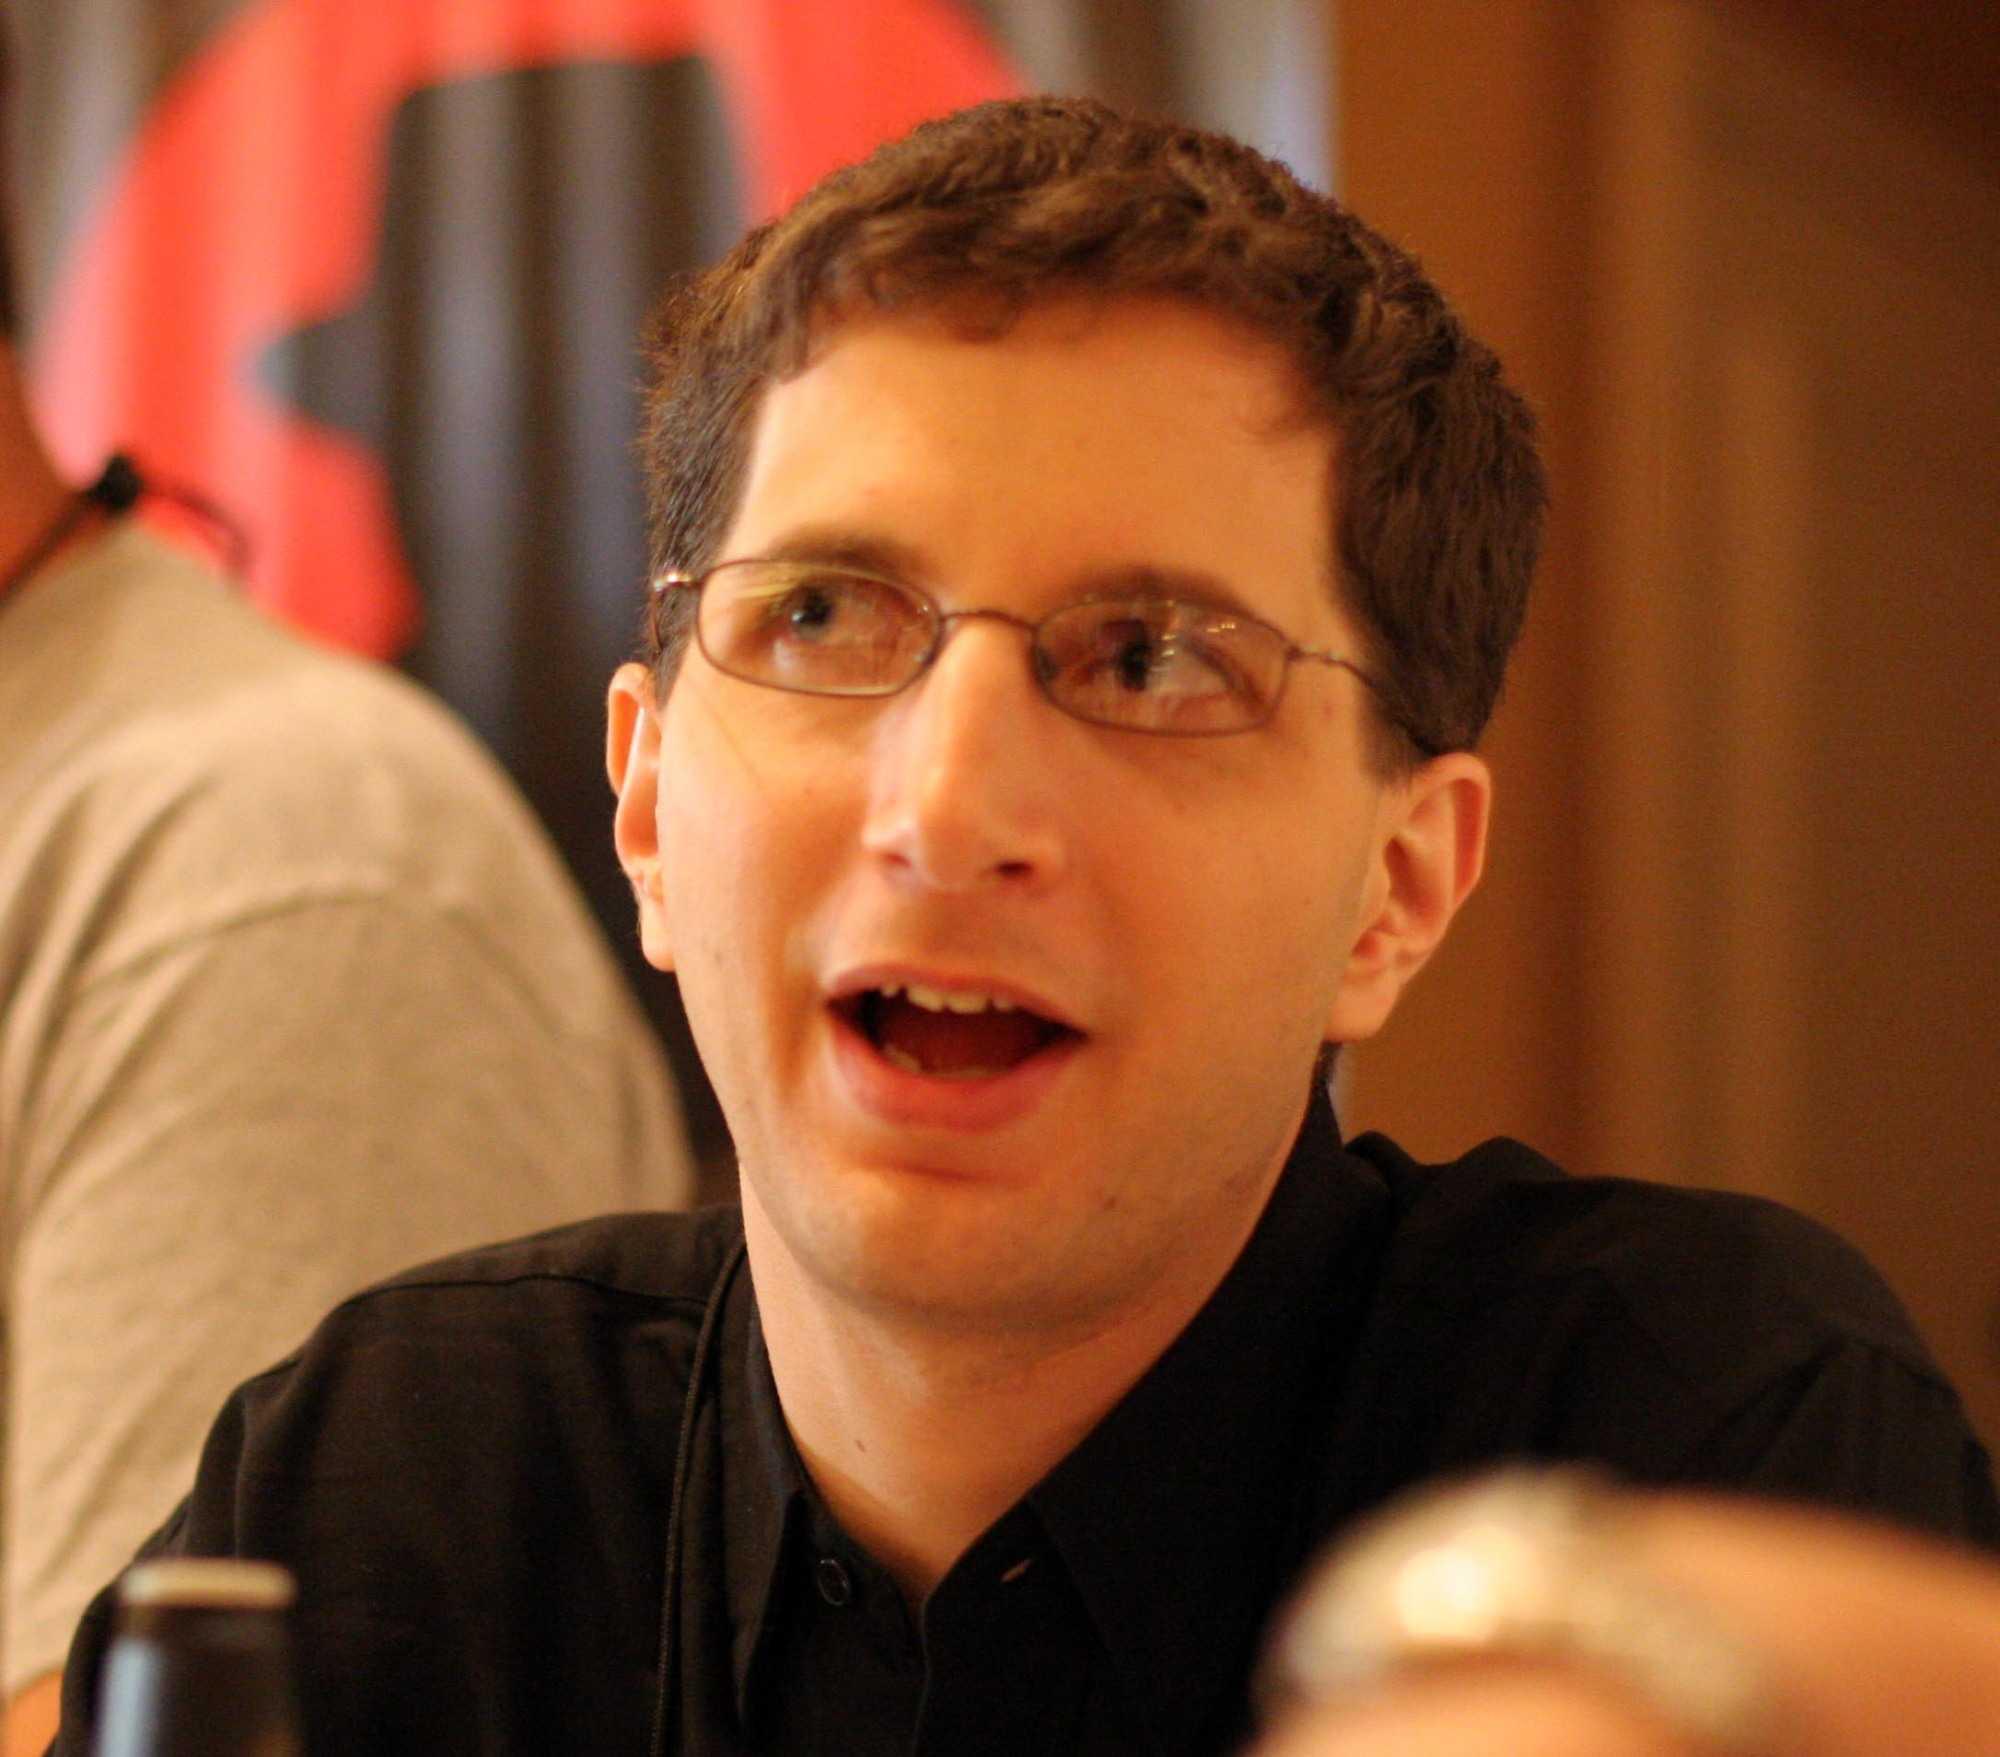 Jeff Moss (Bild: ICANN)